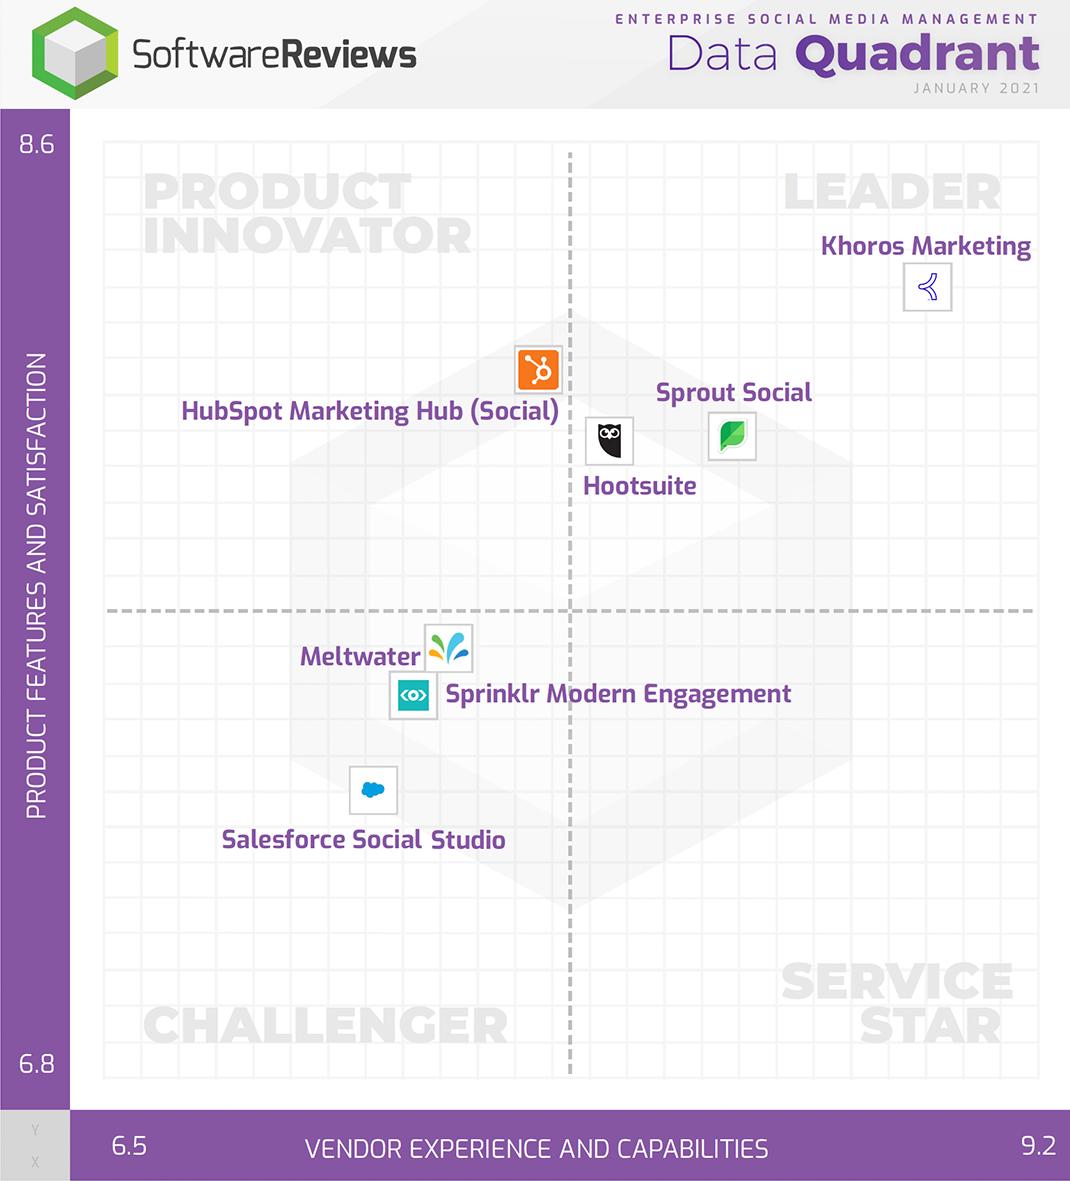 Enterprise Social Media Management Data Quadrant